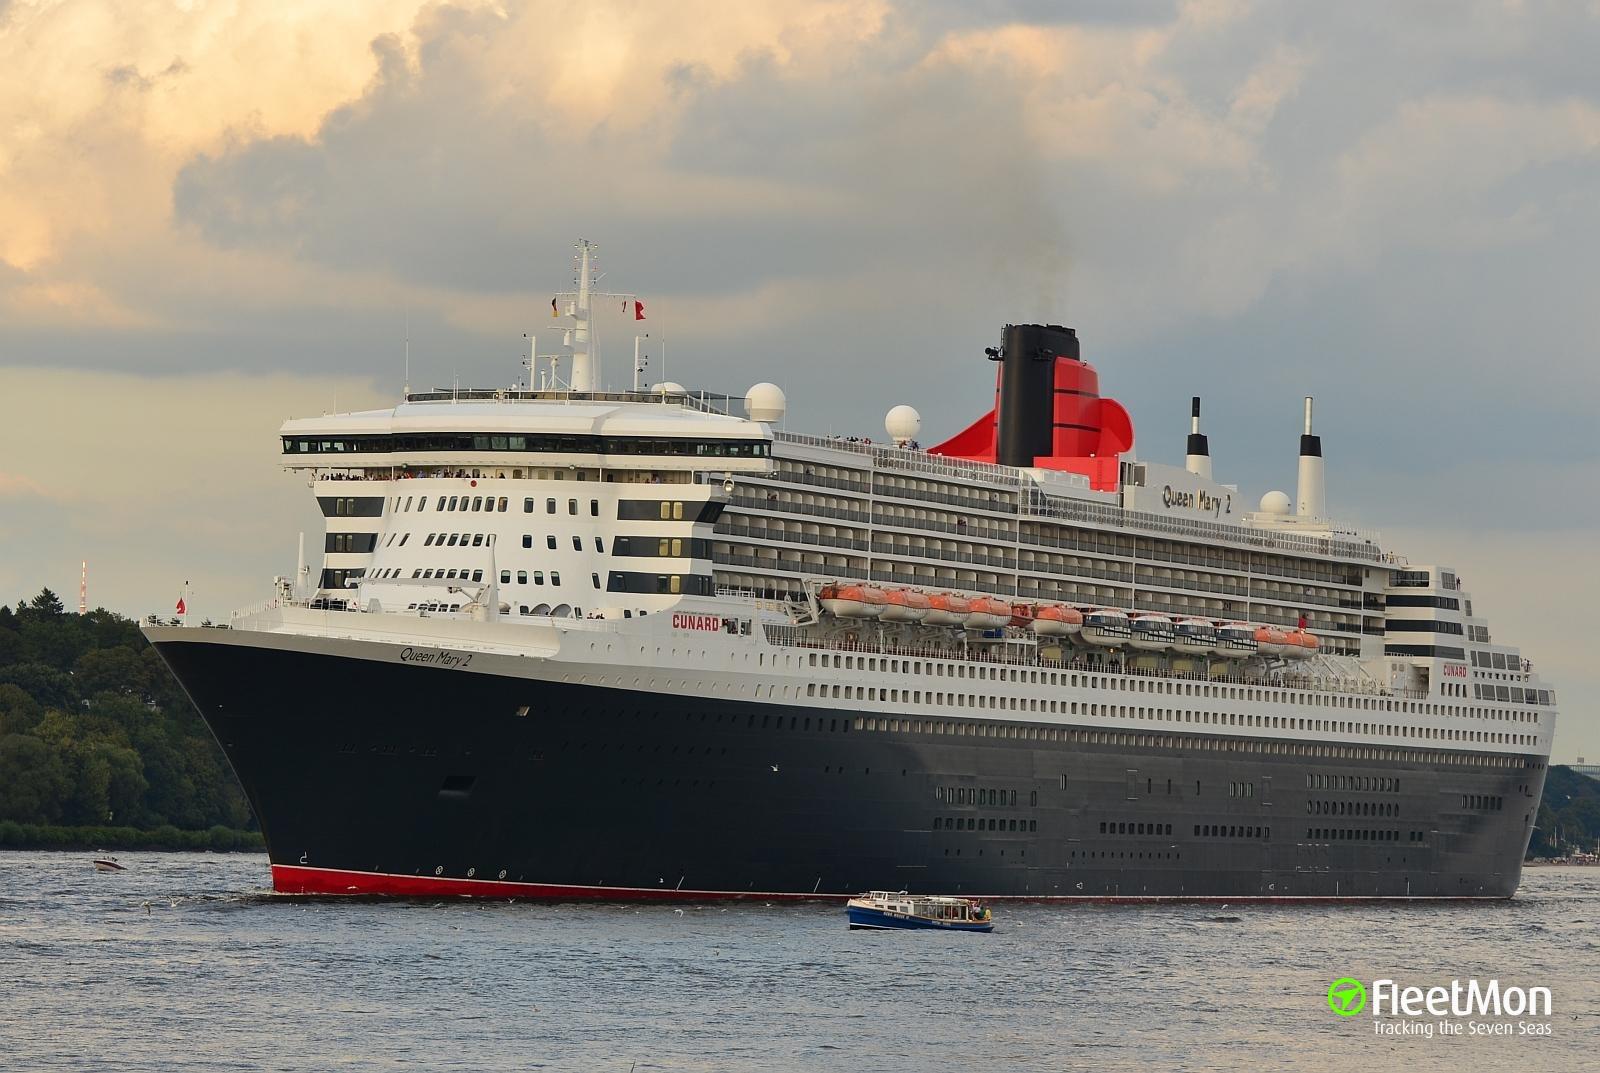 Queen mary 2 photo by fleetmon shipspotter joernva